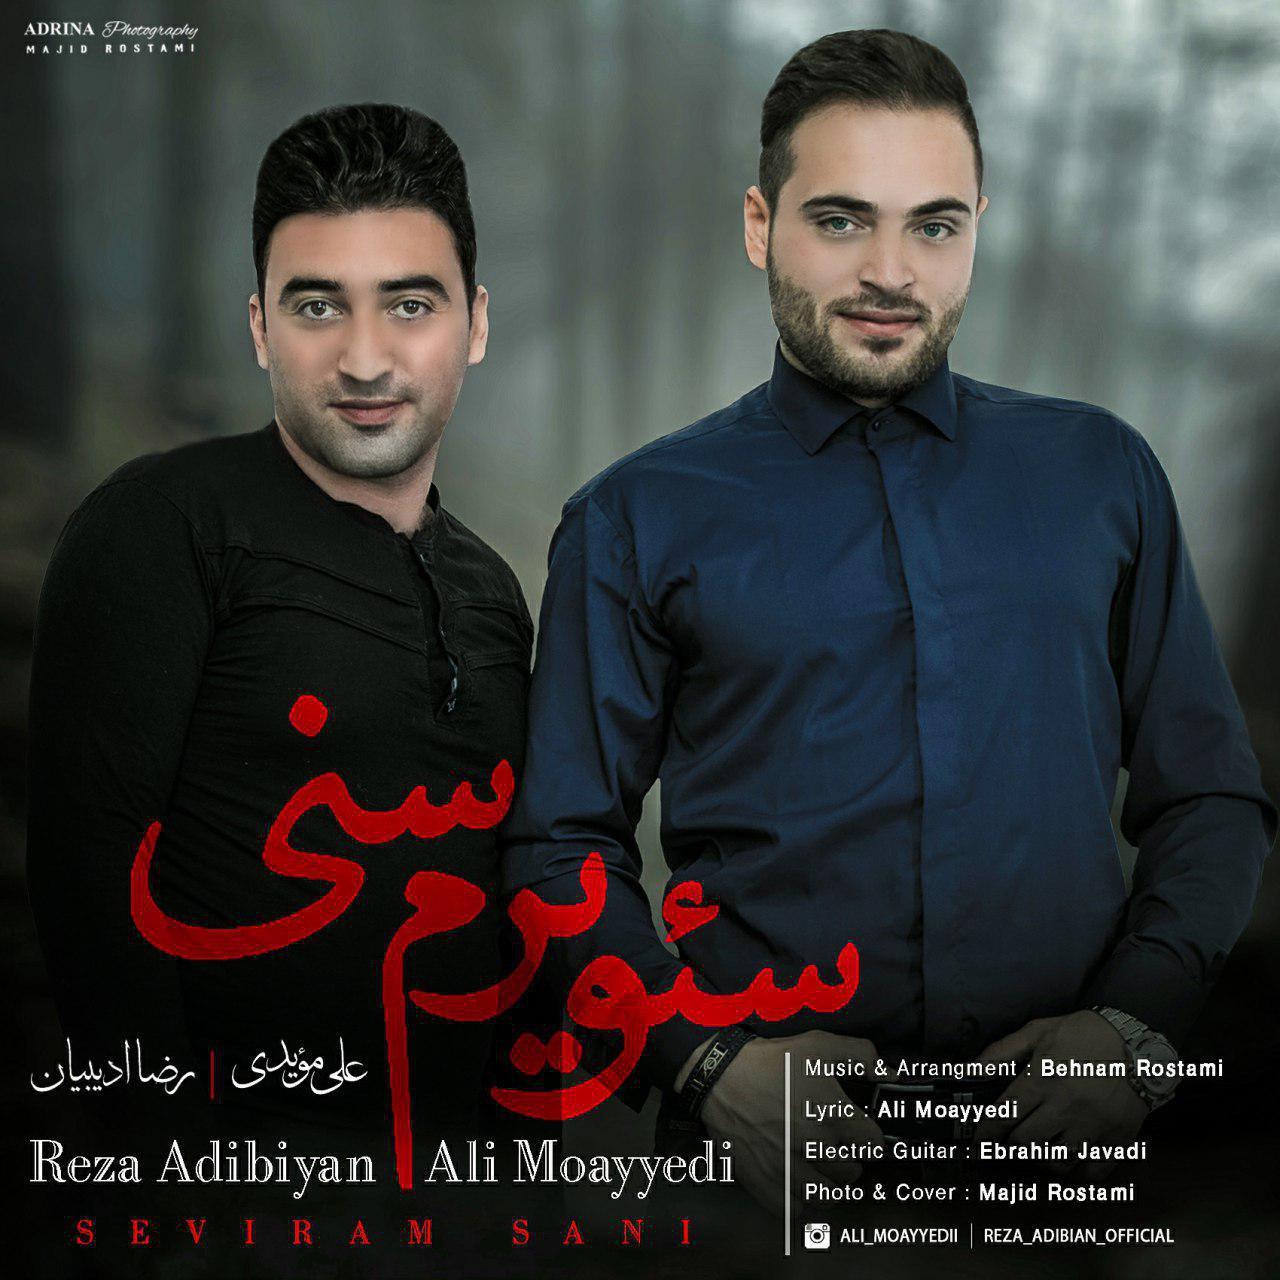 http://s5.picofile.com/file/8375153076/14Reza_Adibiyan_Ali_Moayyedi_Seviram_Sani.jpg